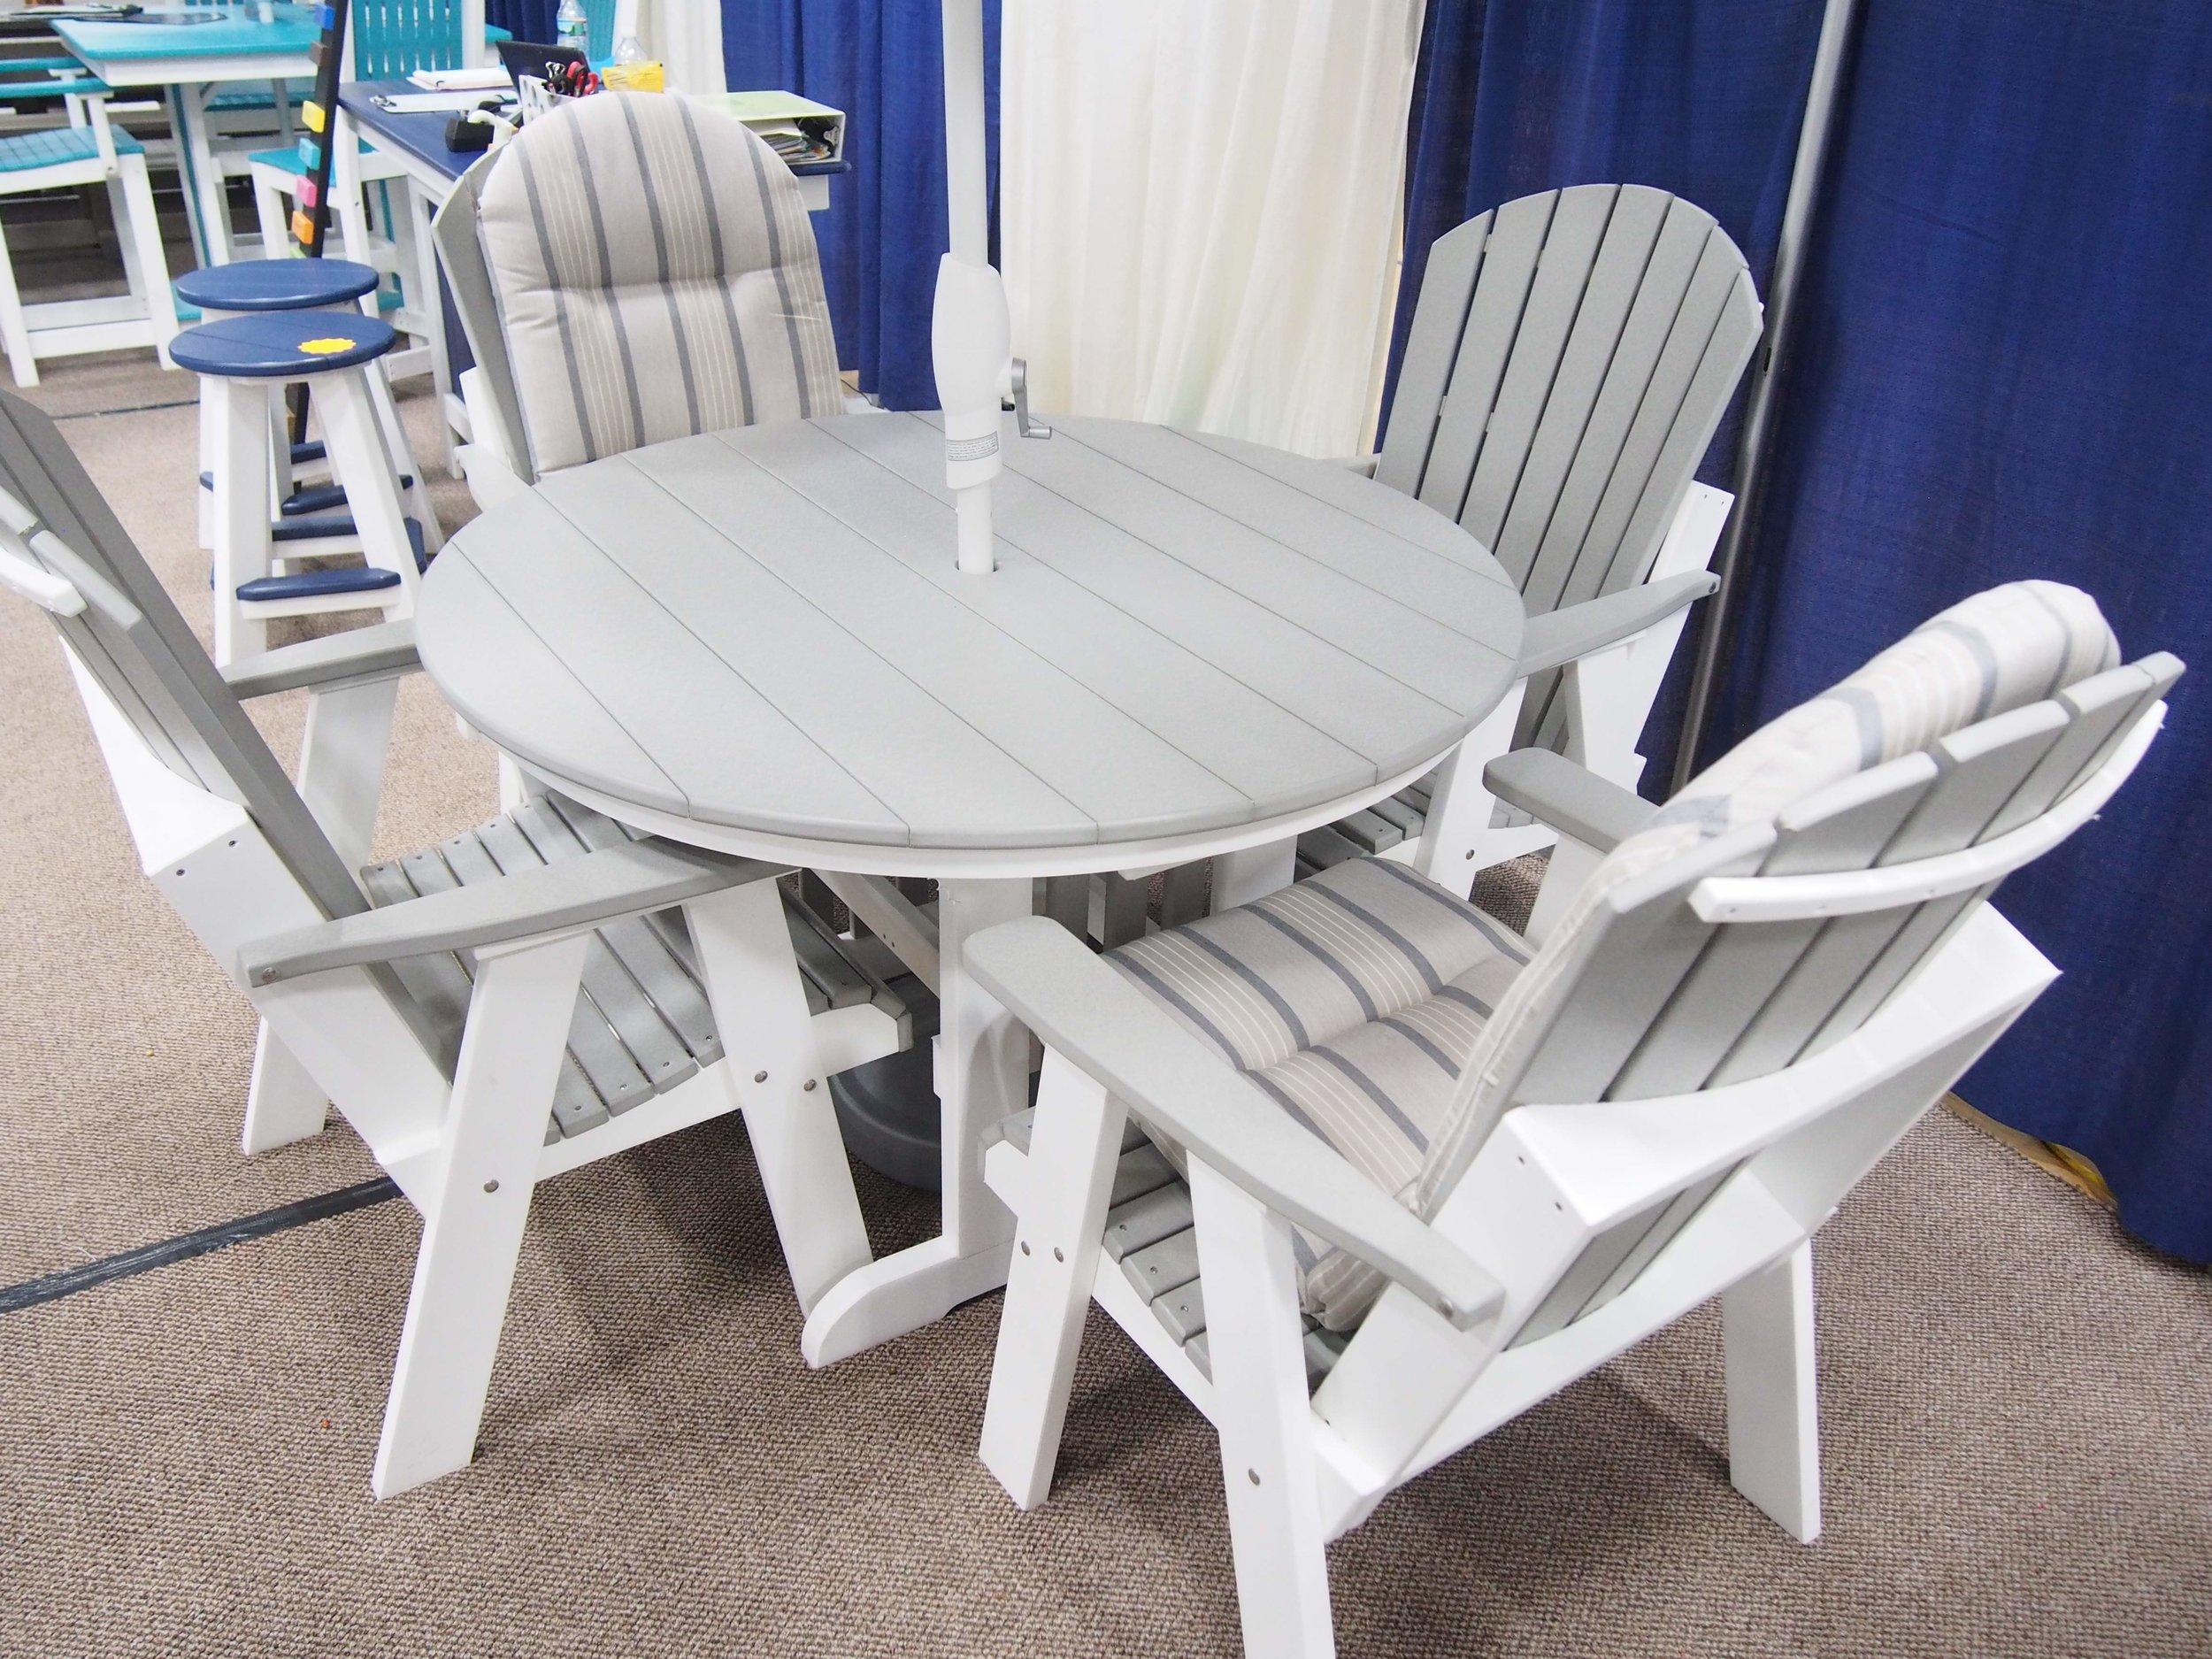 48 Round dining w4 Addy chairs 1997..jpg